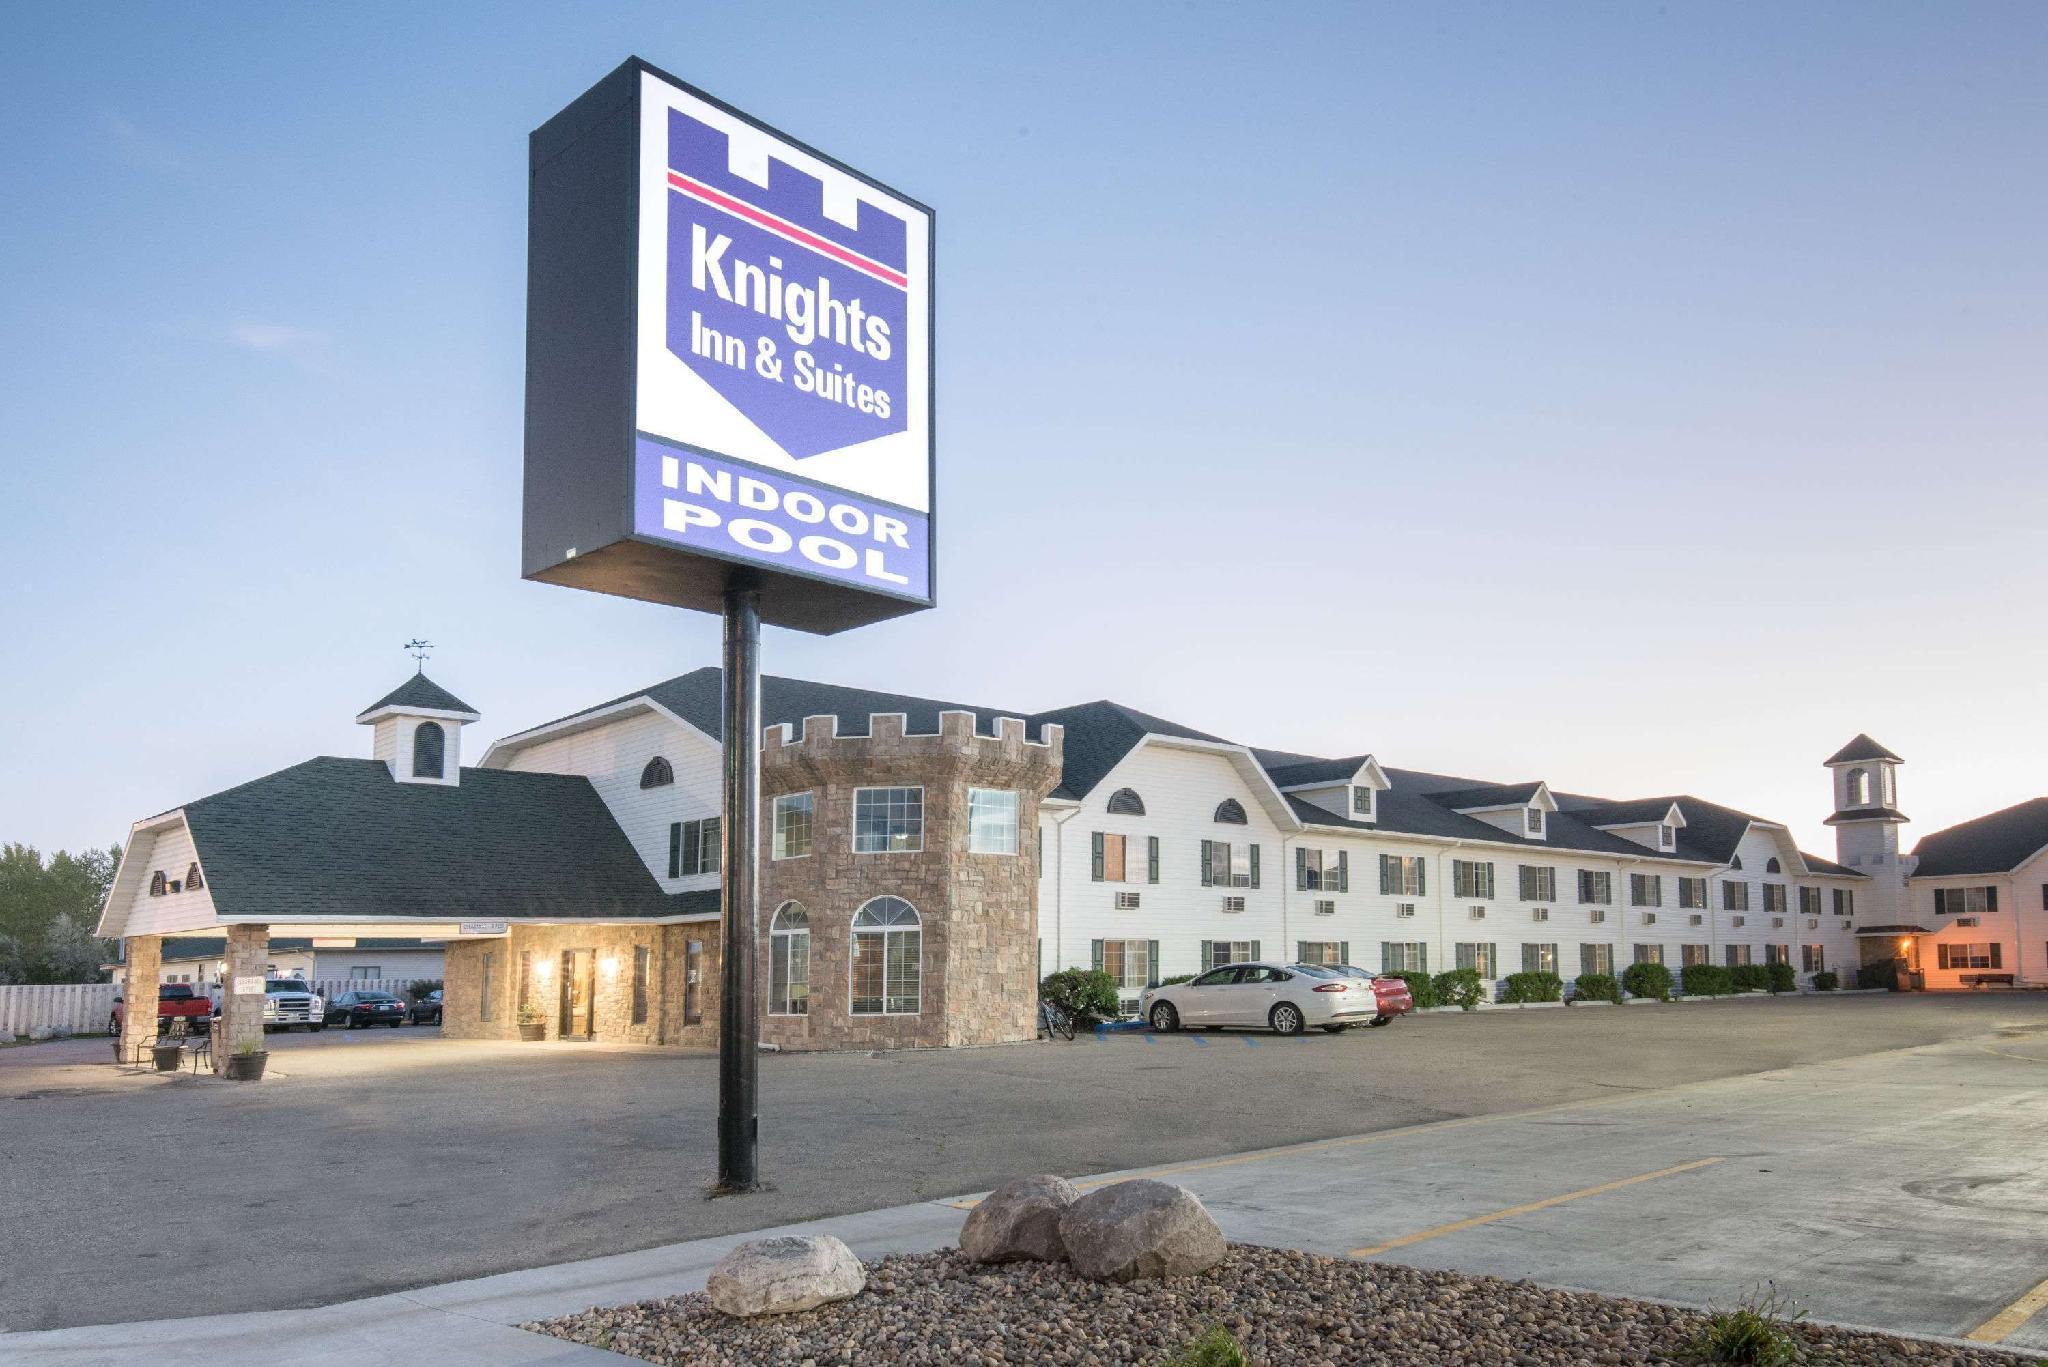 Knights Inn - Grand Forks, ND, Grand Forks